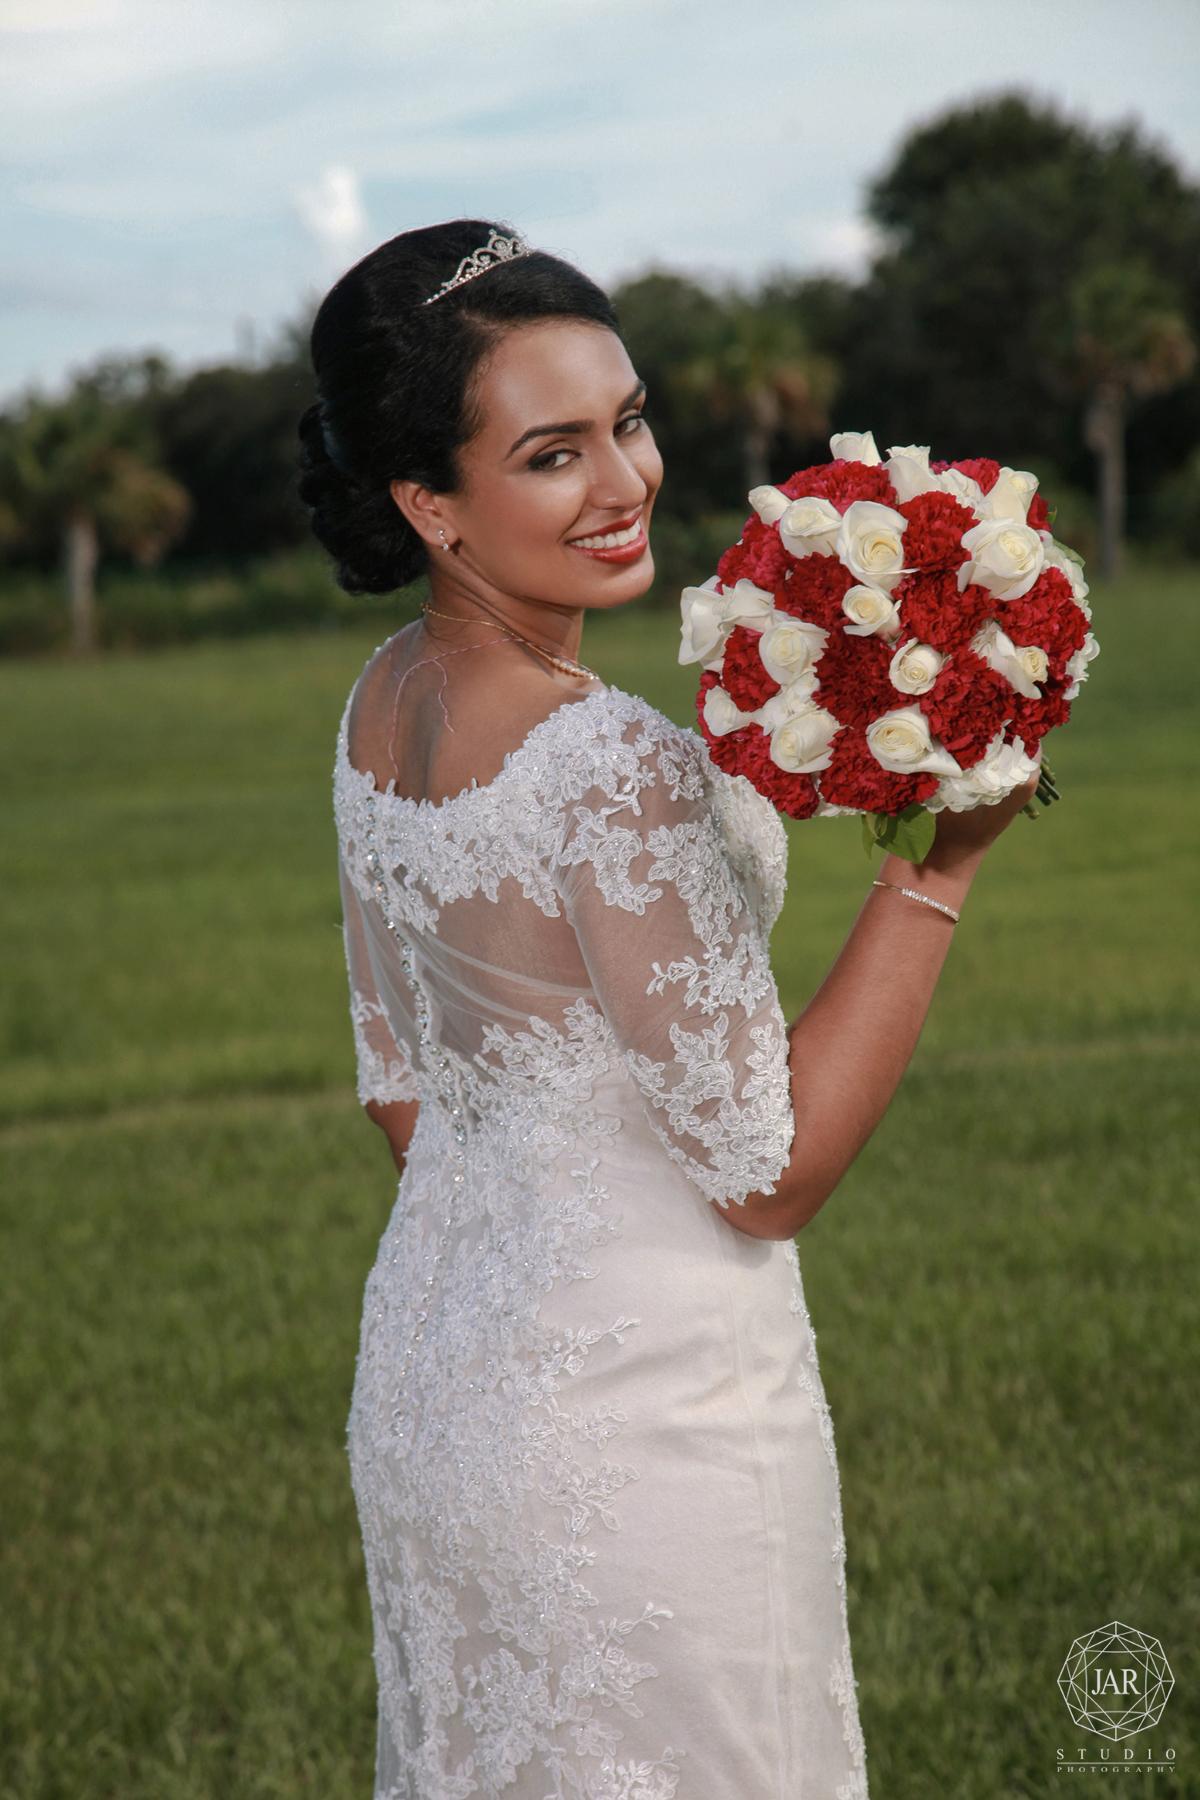 27-stunning-wedding-dress-2017-trends-jarstudio-disney-weddings-photographer.jpg